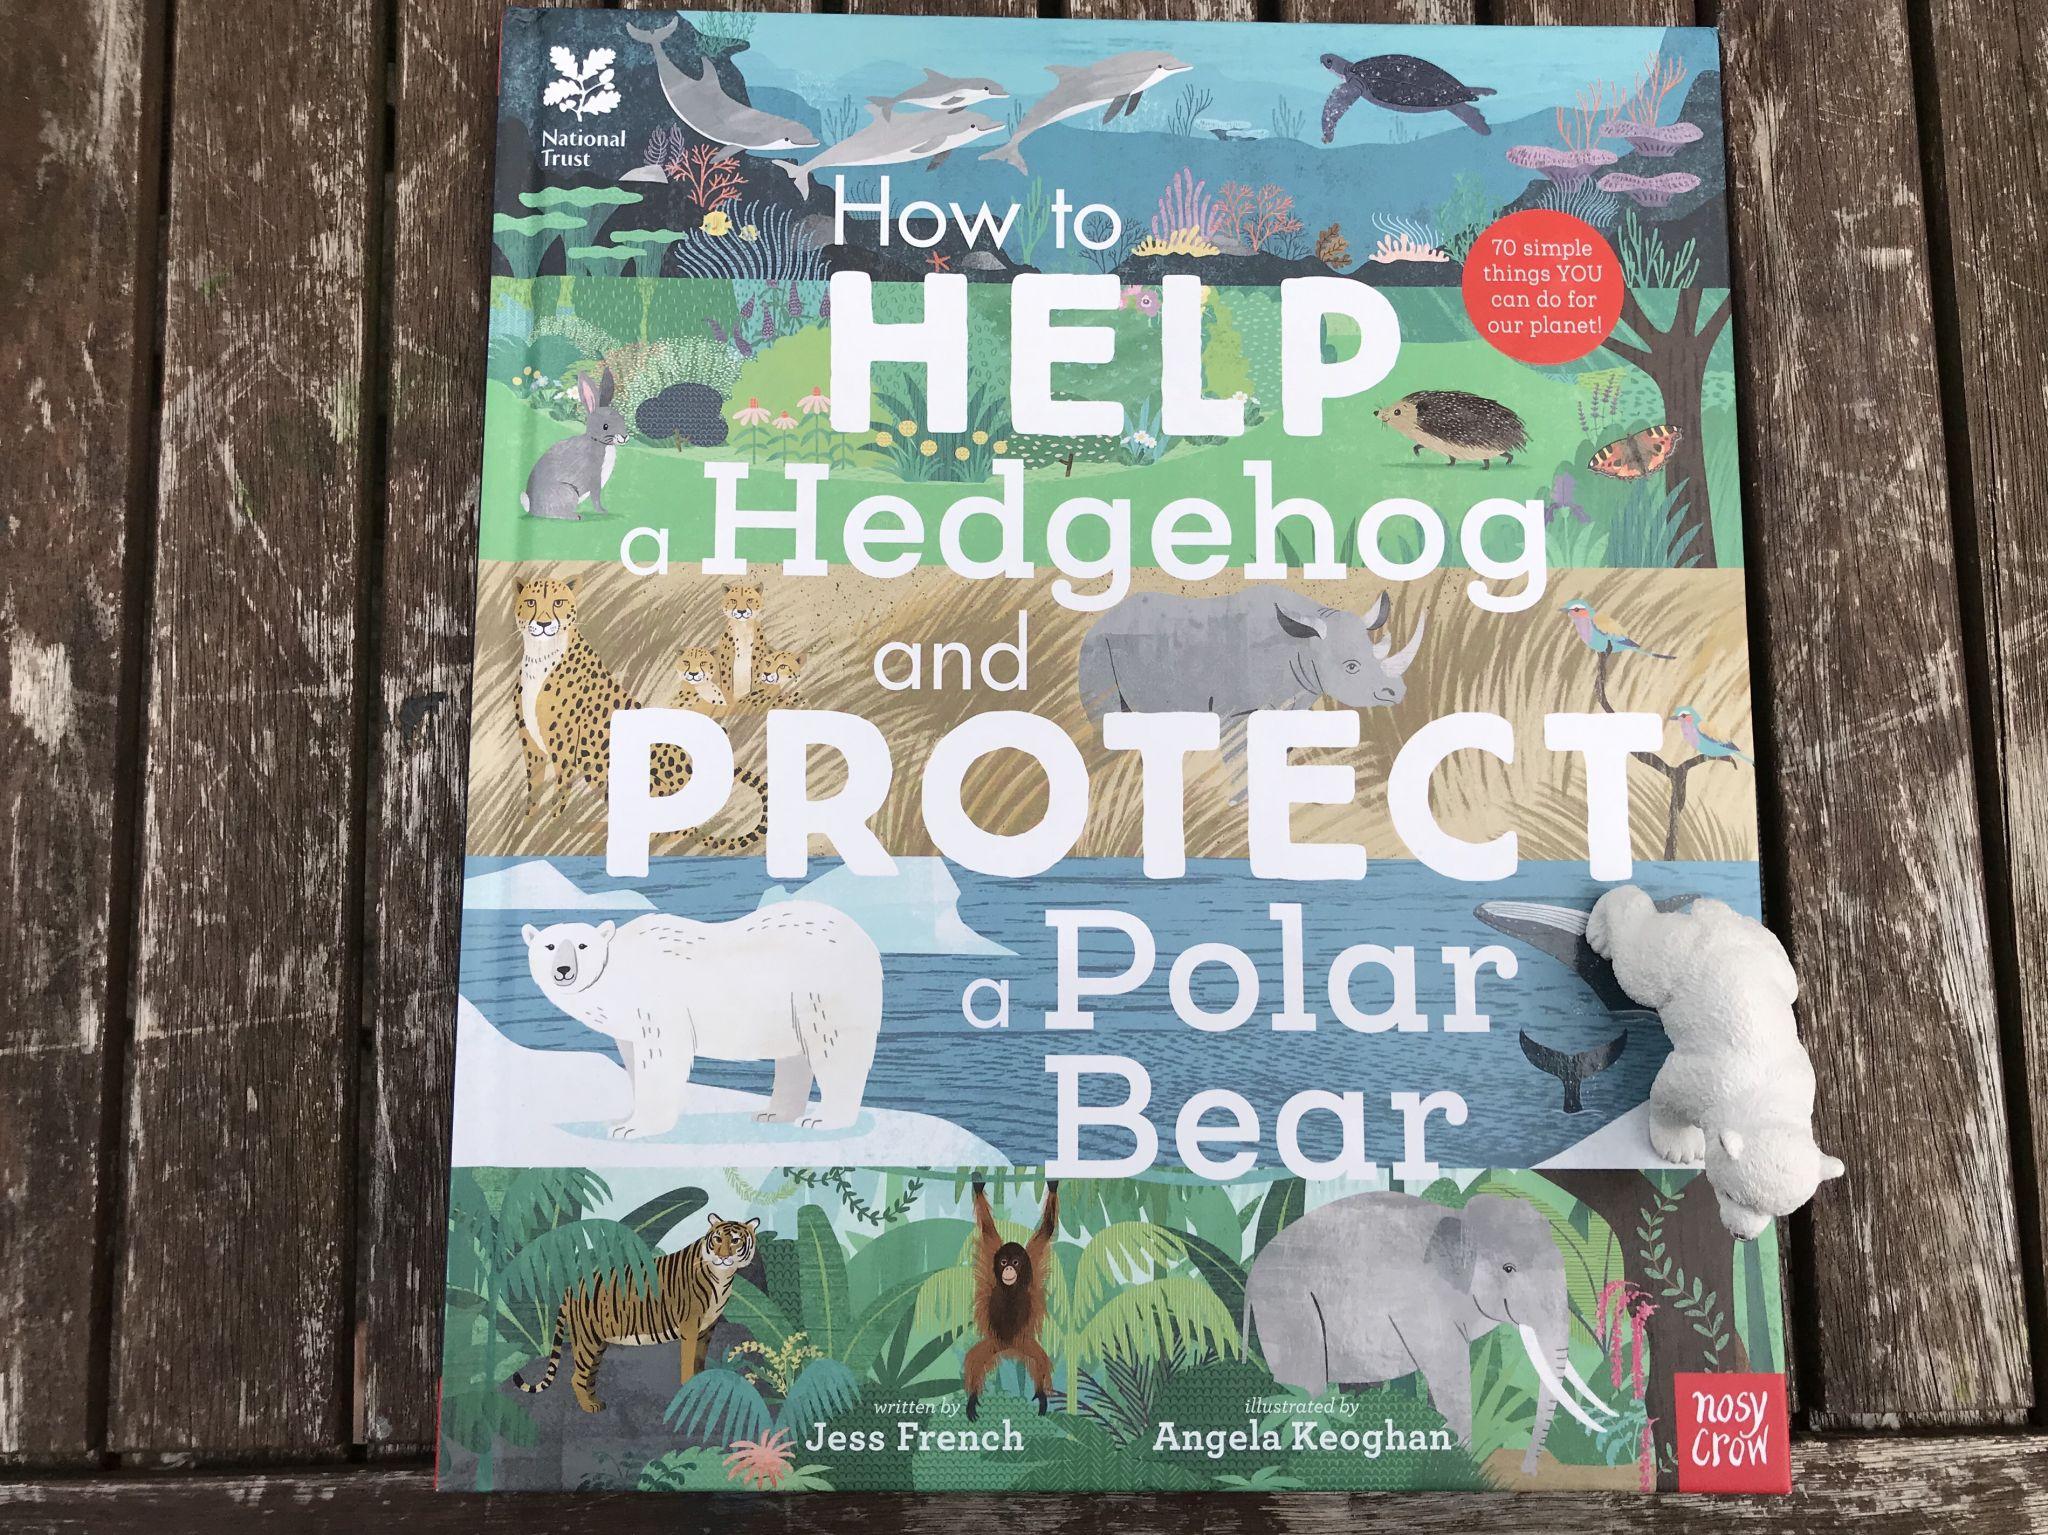 The book how to help a hedgehog and protect a polar bear